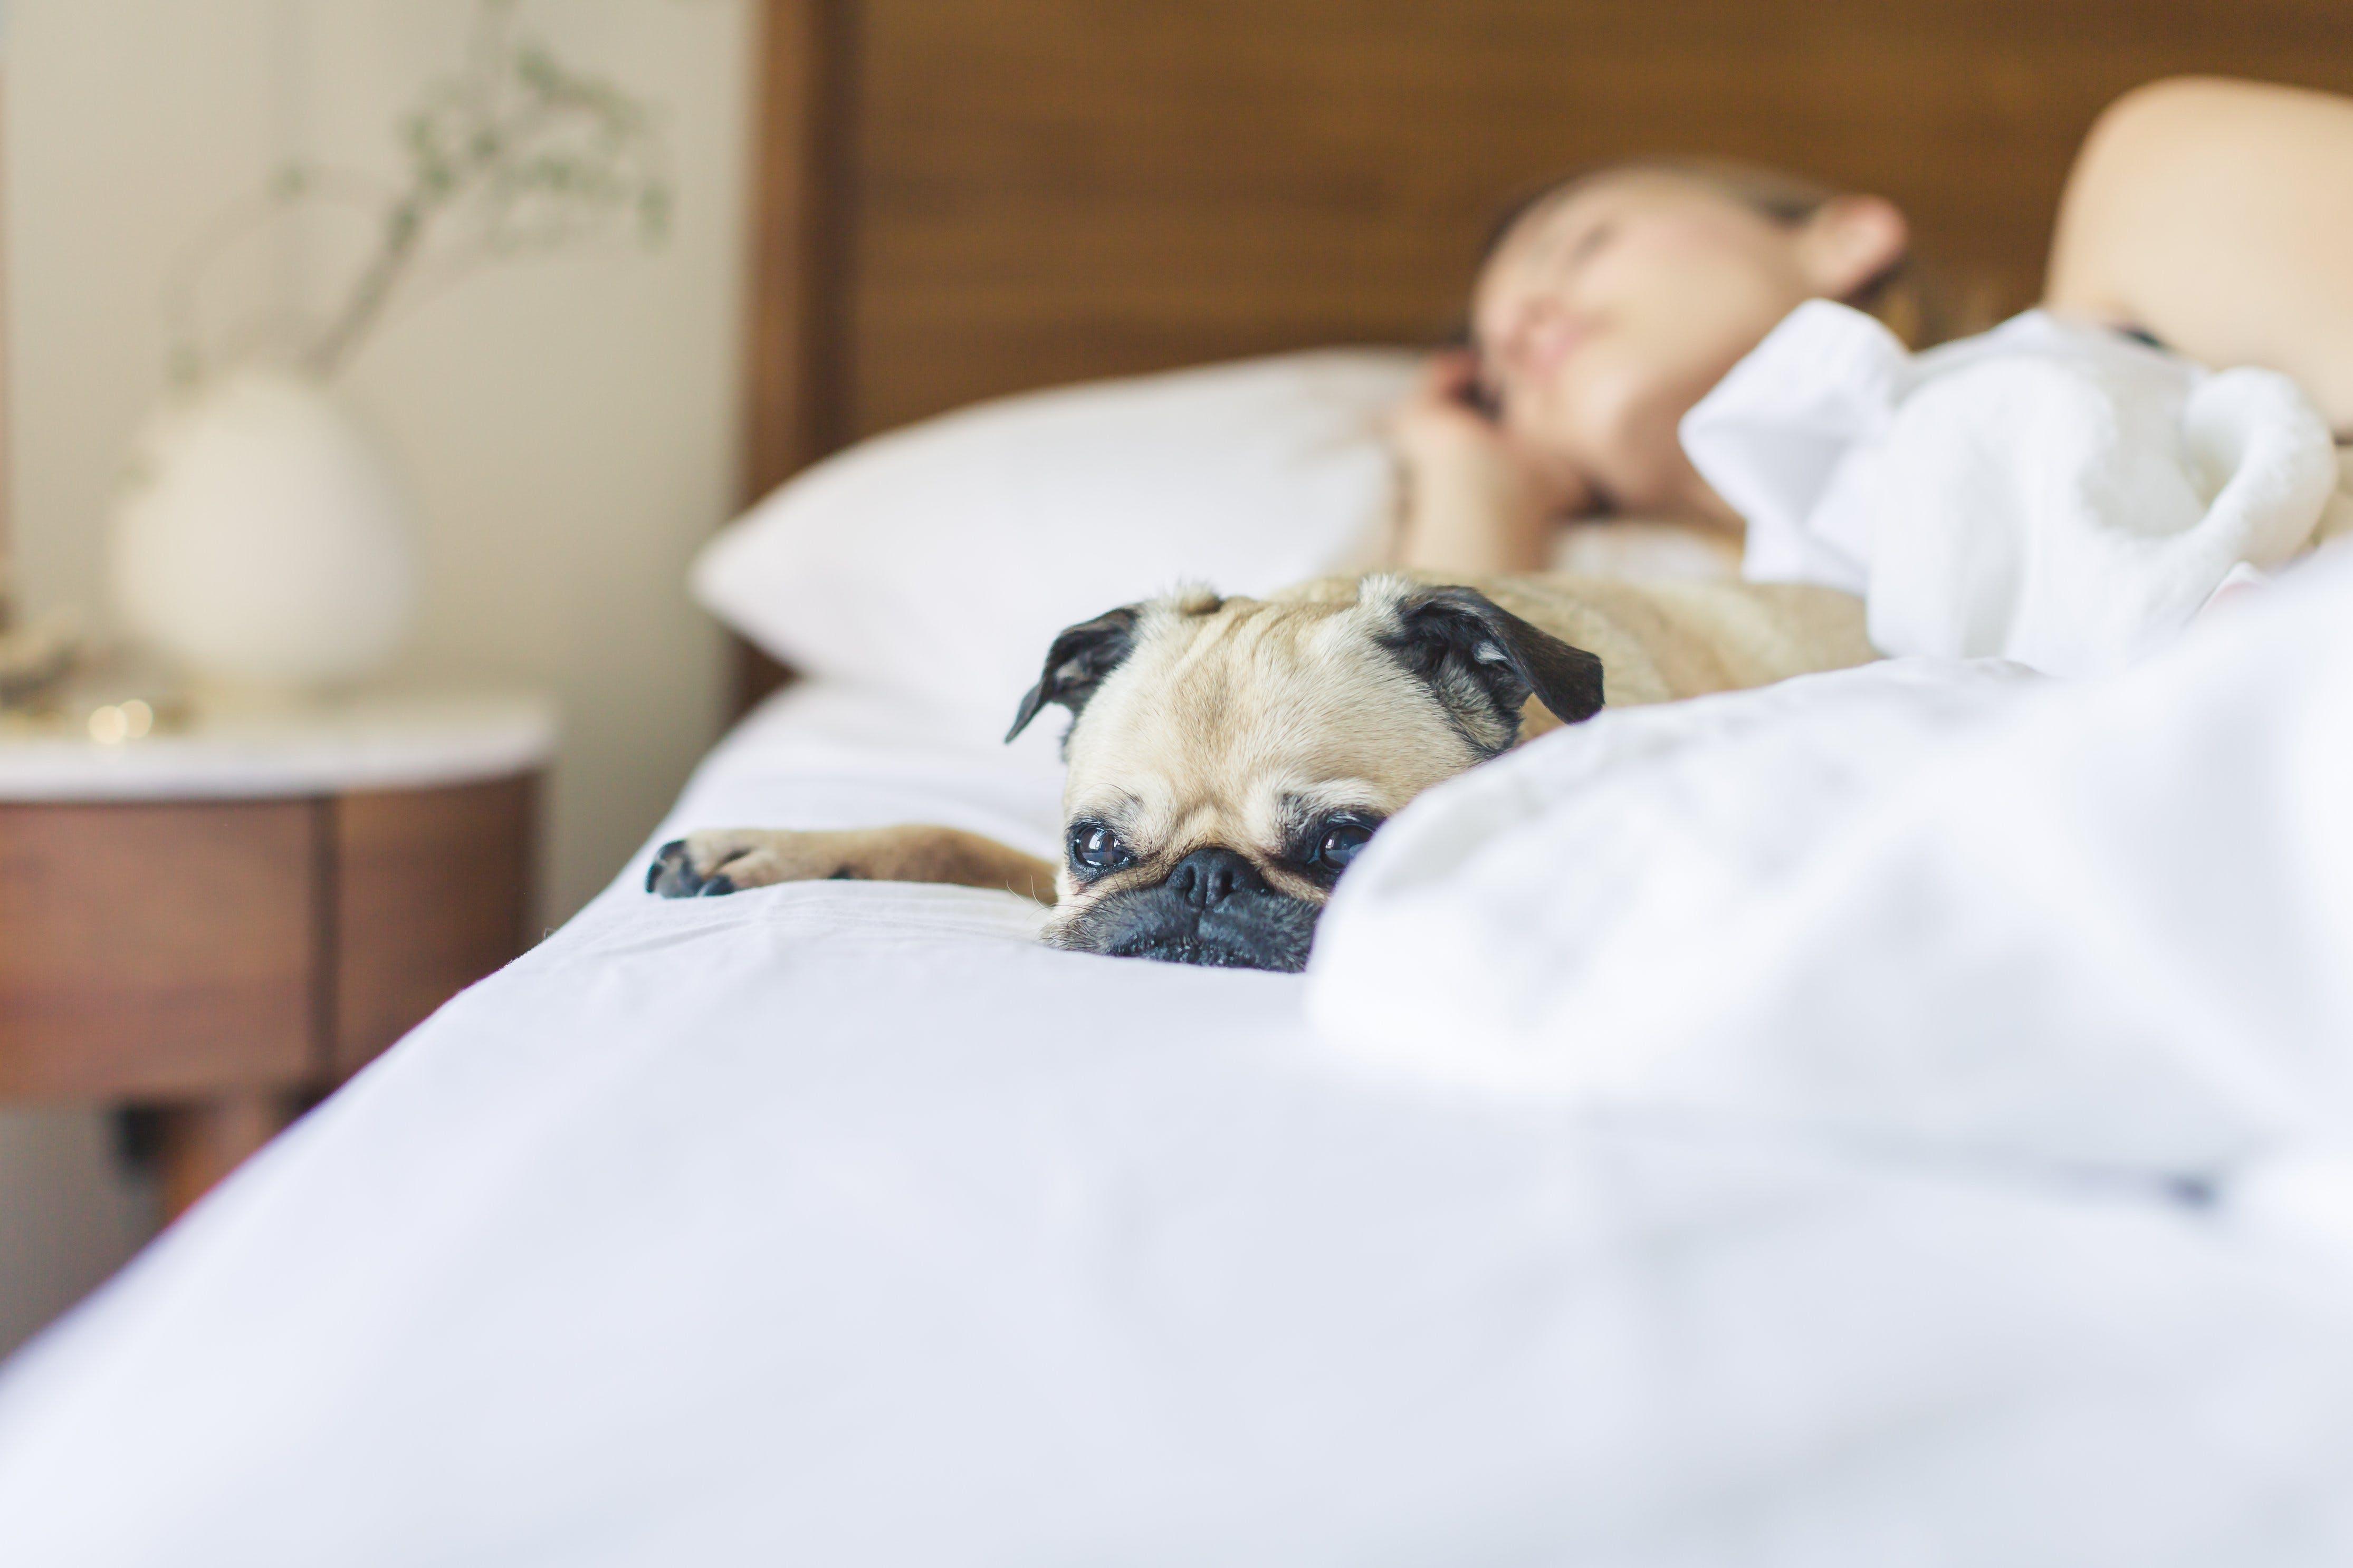 Fawn Pug Lying on Bed Beside Sleeping Woman